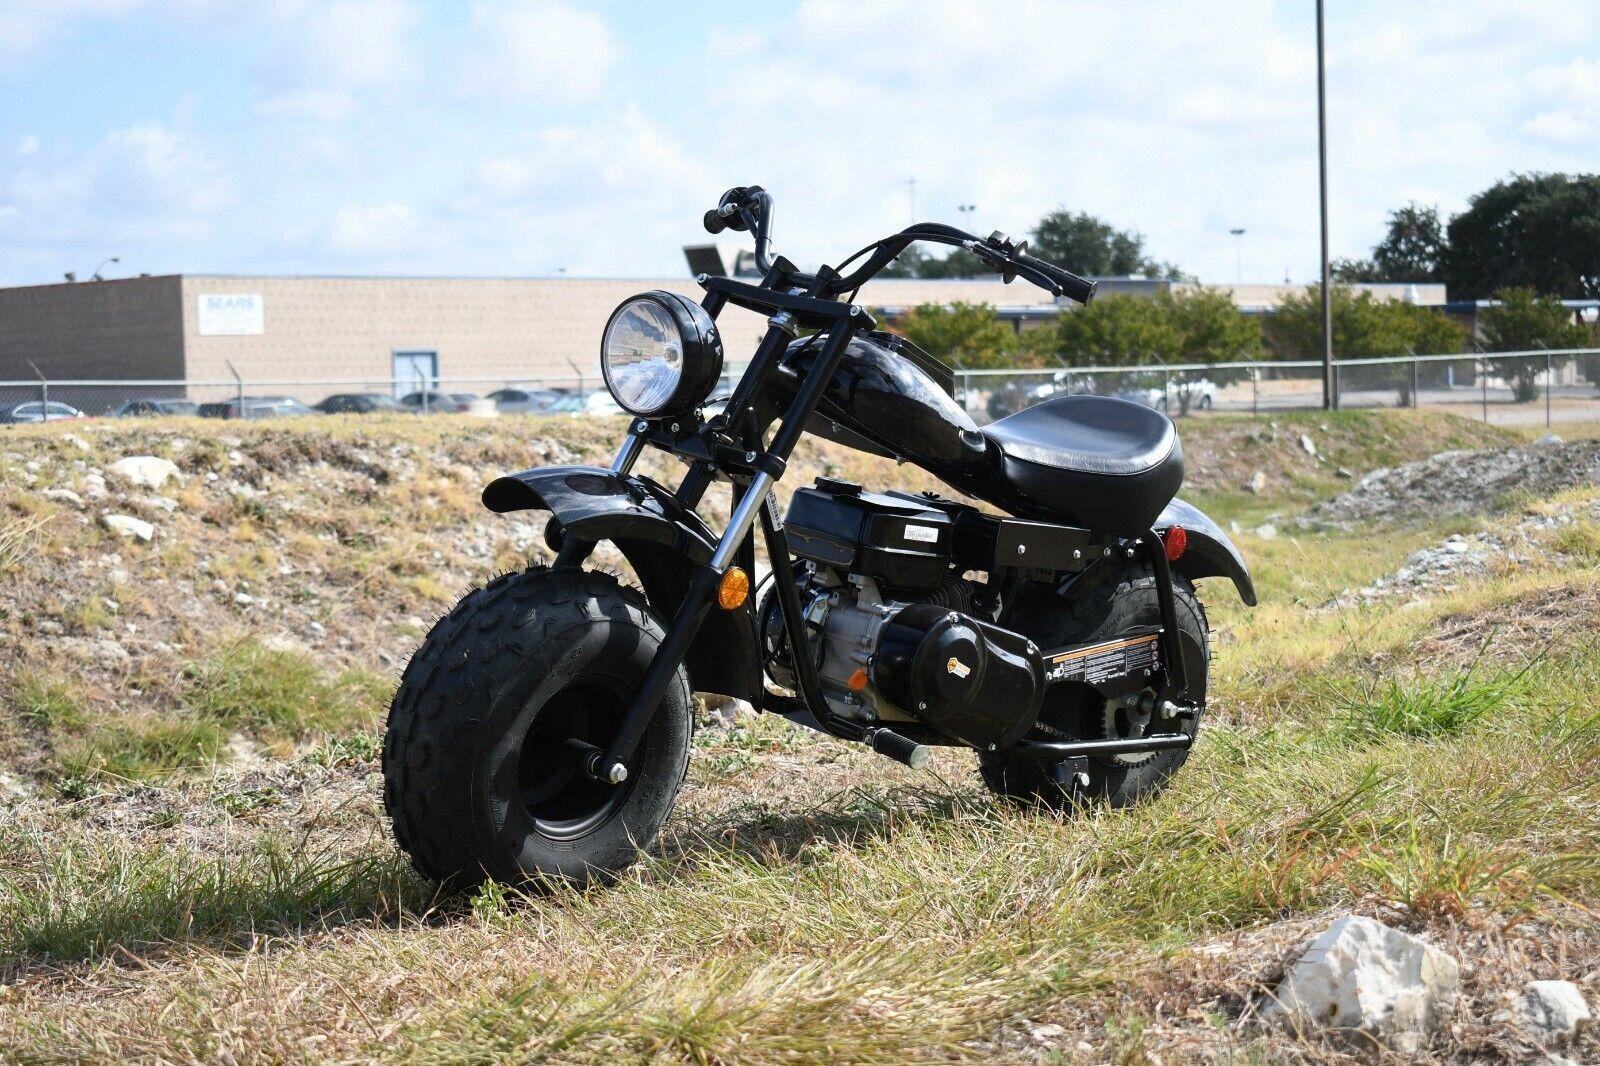 MASSIMO MB200 SUPERSIZED 196cc MINI BIKE MOTORCYCLE - BLACK